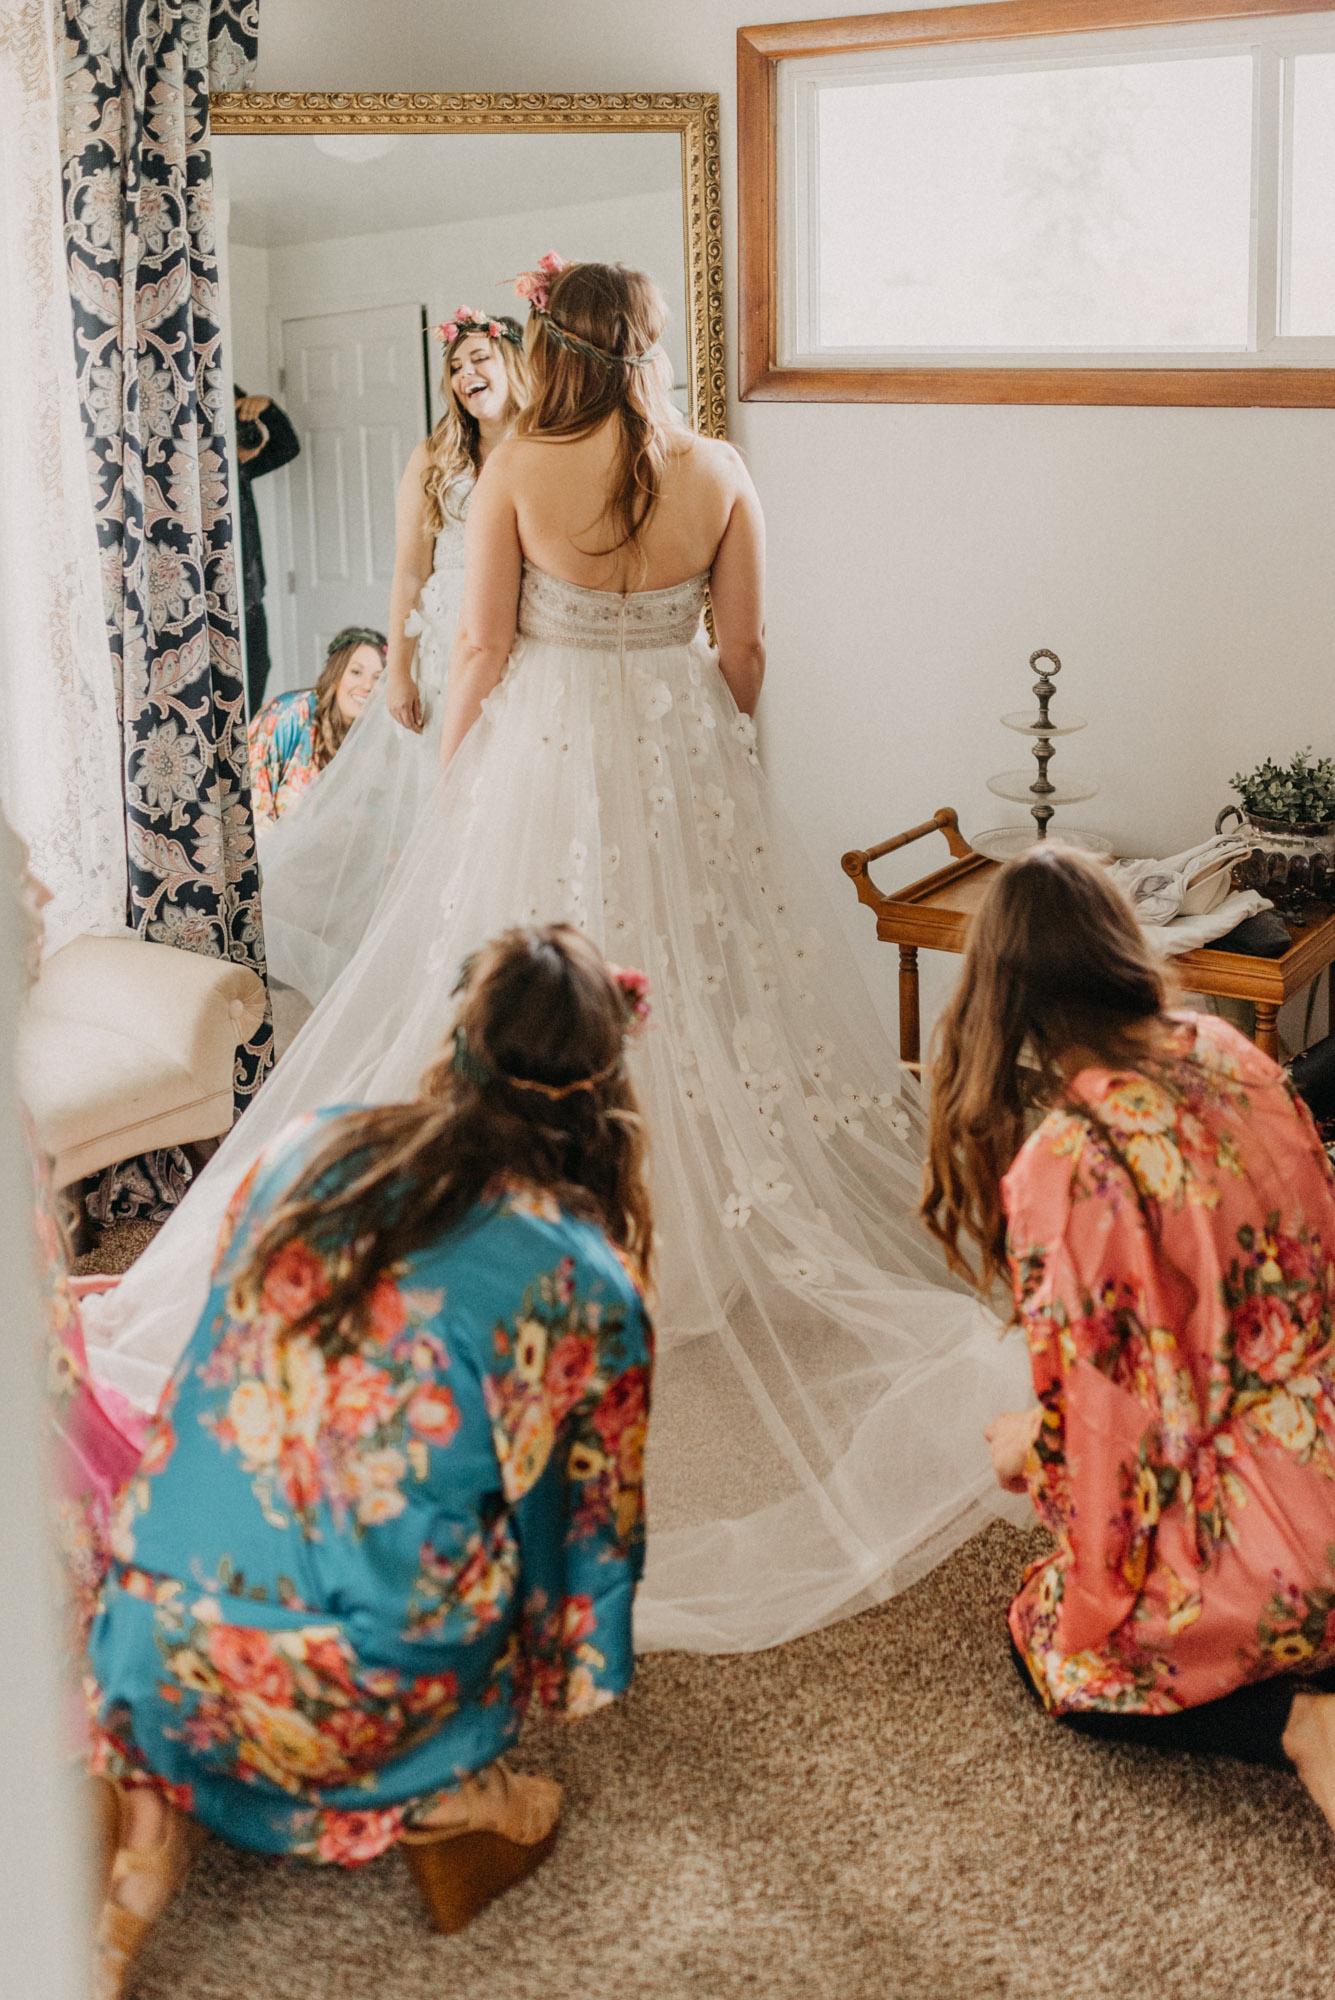 Getting-Ready-Swingset-Washington-Wedding-ringshot-8039.jpg